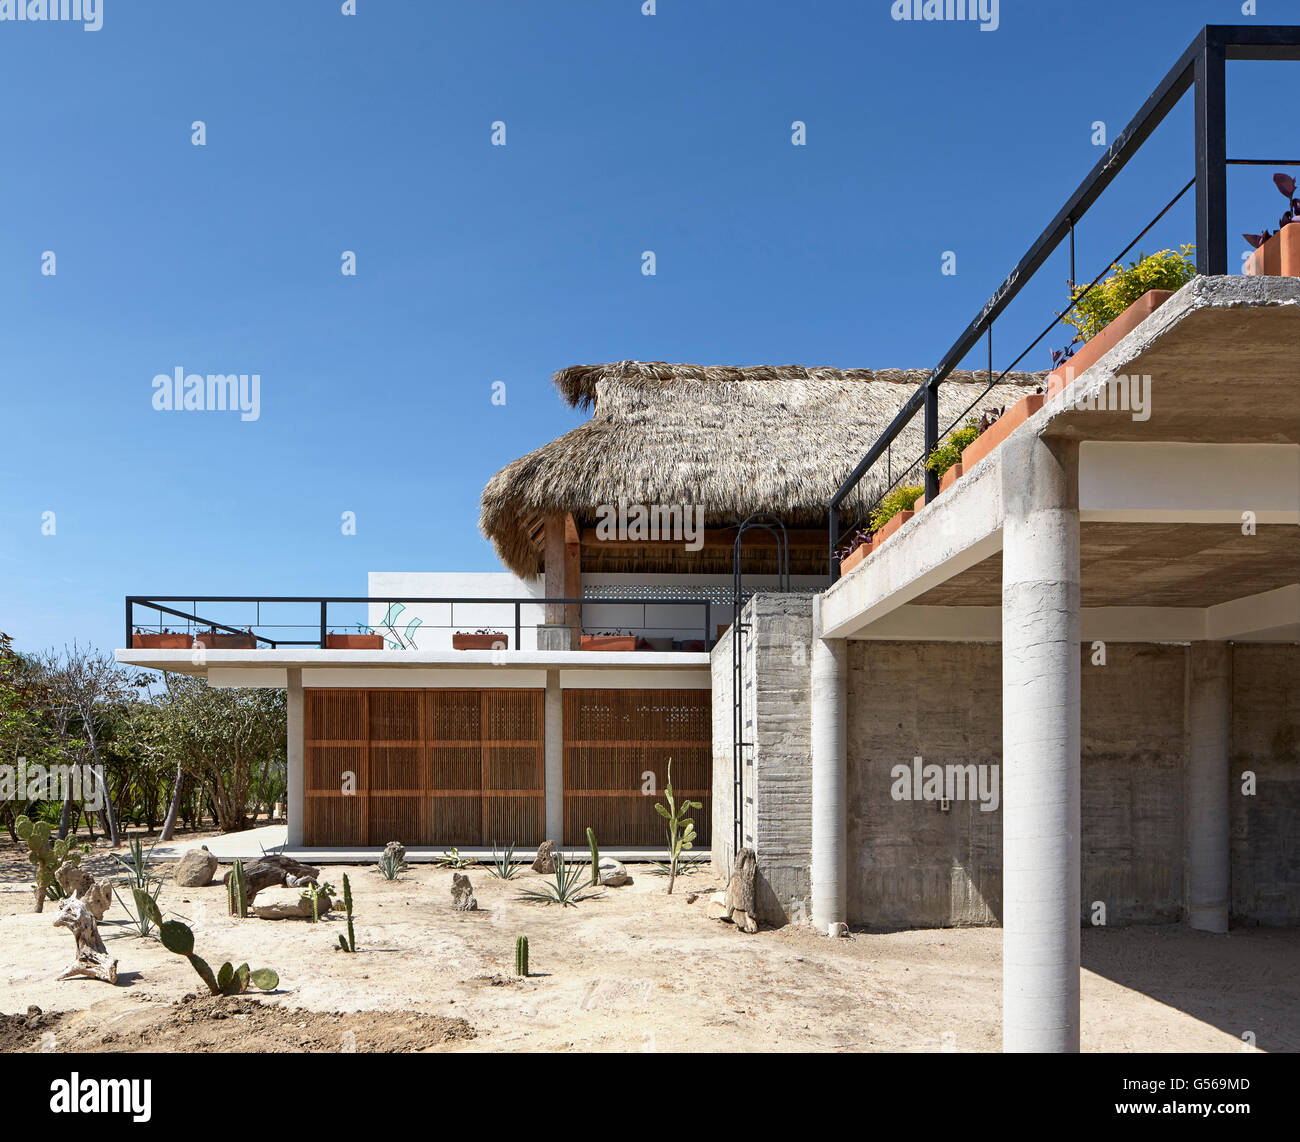 Overall exterior view from side. Casa Cal, Puerto Escondido, Mexico. Architect: BAAQ, 2015. - Stock Image